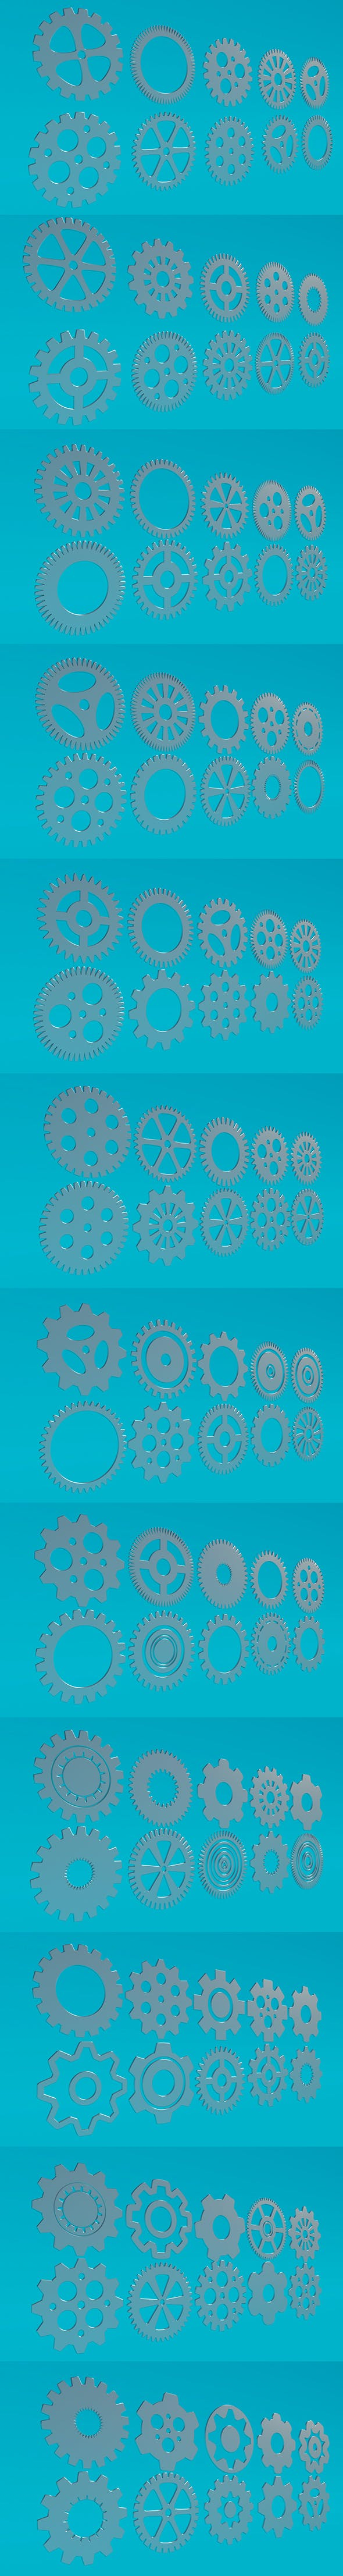 Gears Pack - 3DOcean Item for Sale